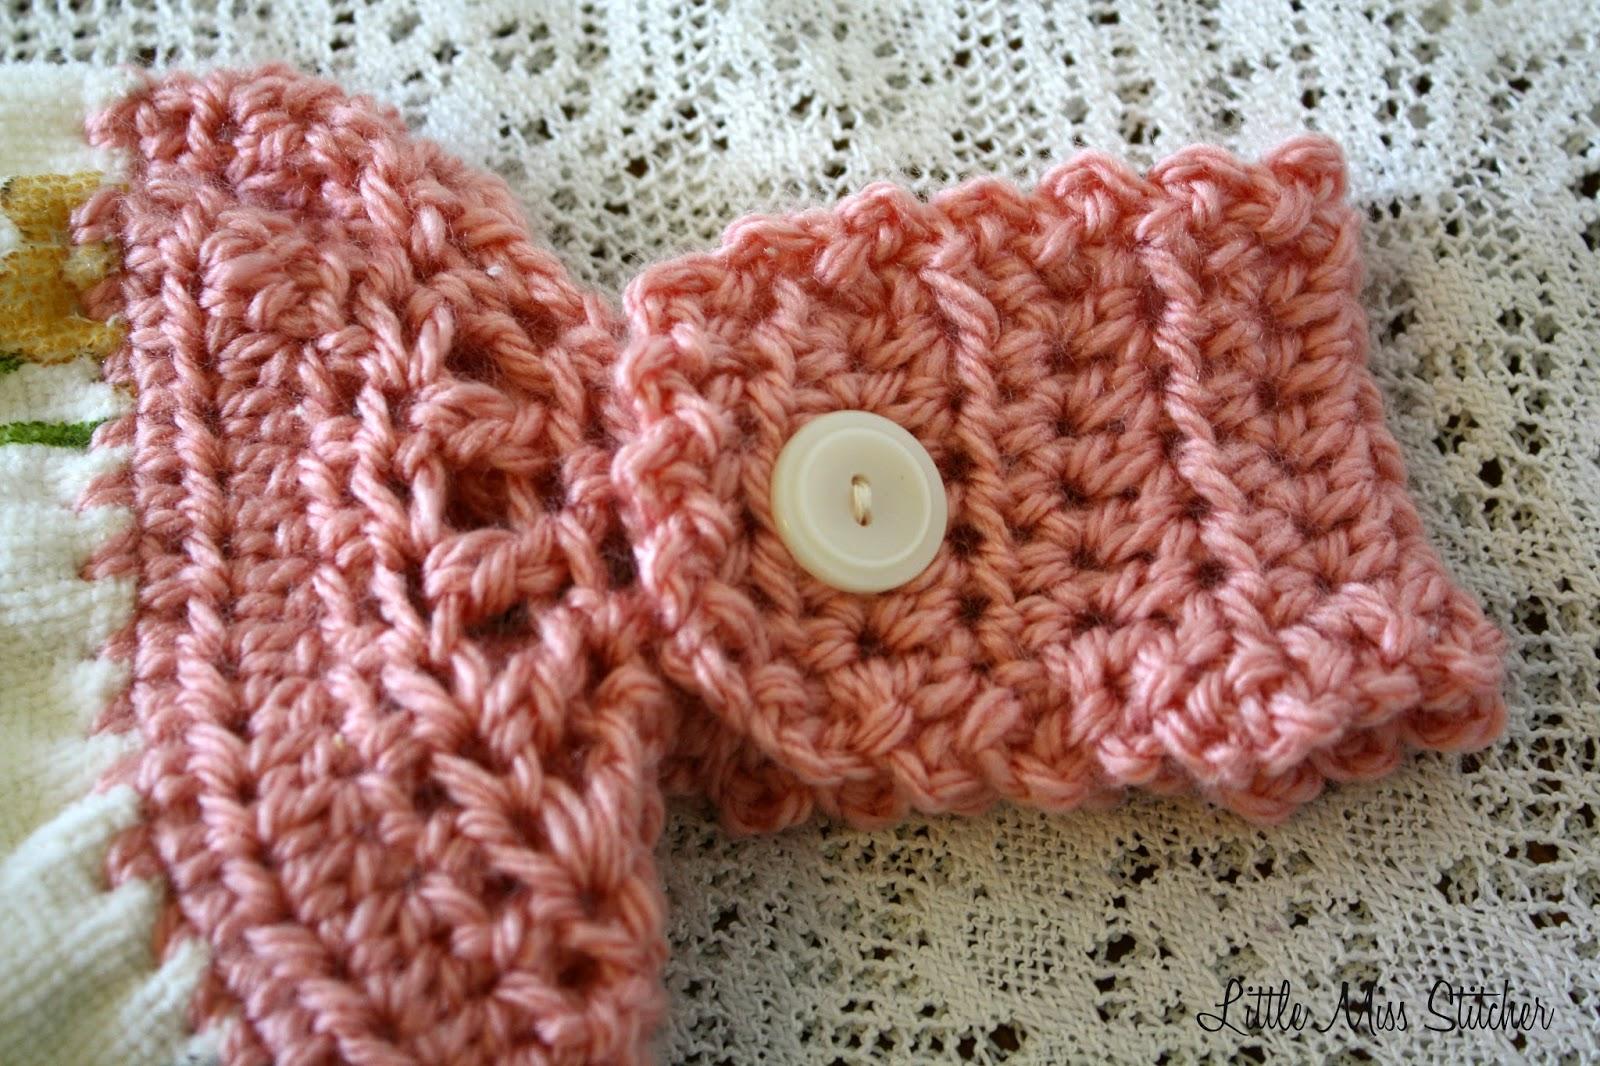 http://little-miss-stitcher.blogspot.com/2014/03/quick-and-easy-crochet-towel-topper.html